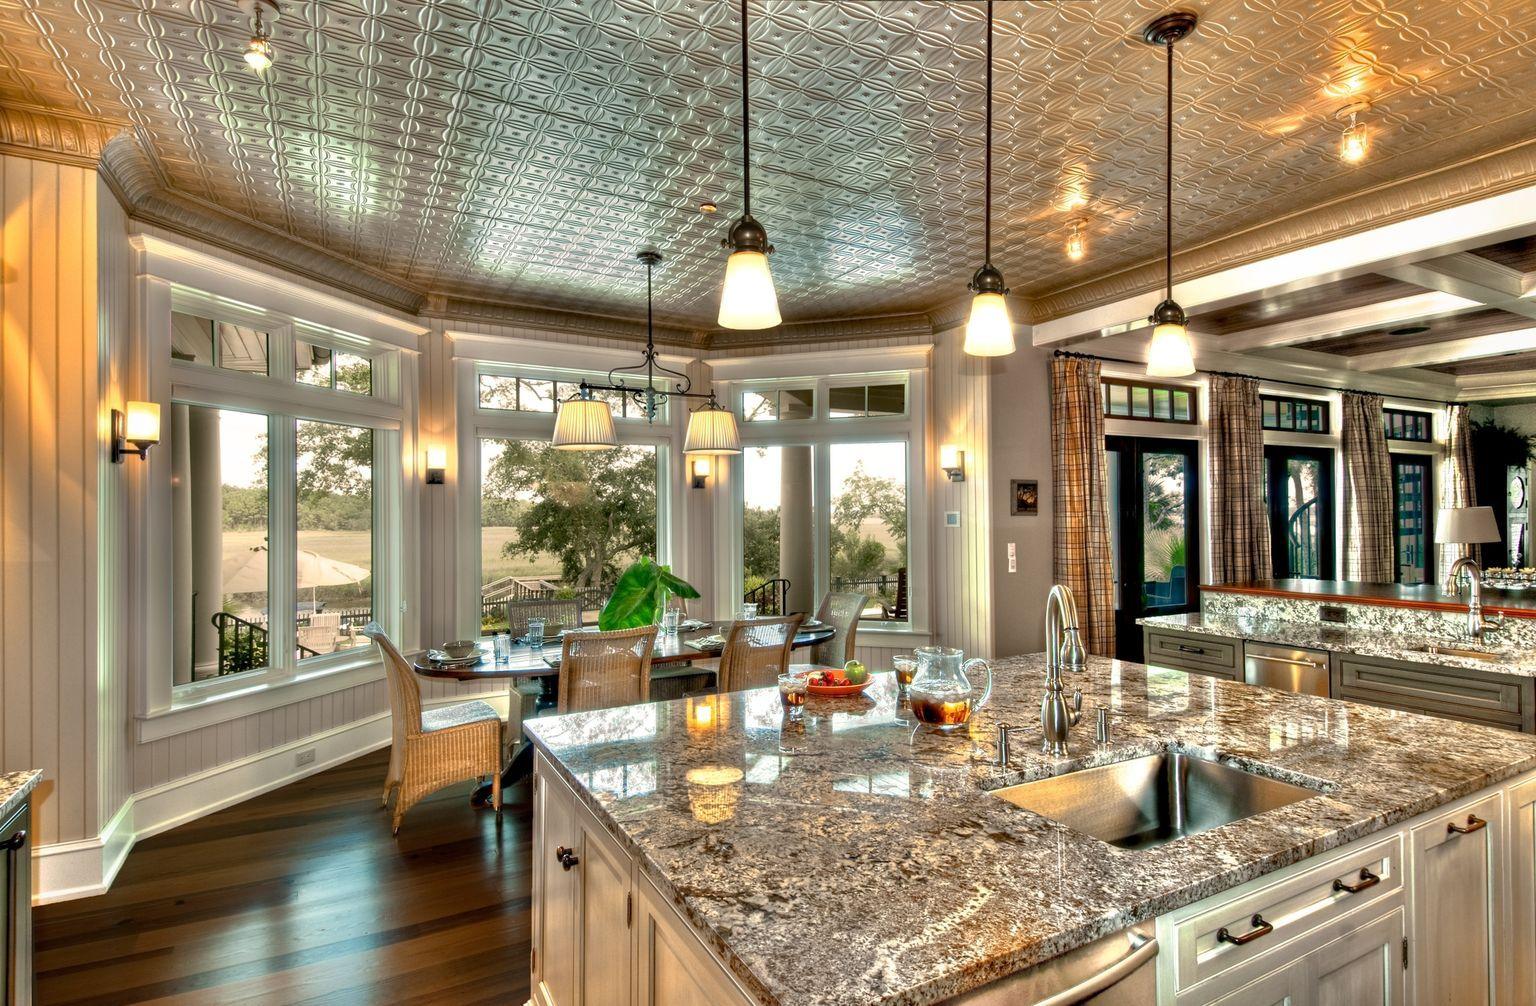 Daniel Island Creekside — Herlong & Associates Architecture + Interiors